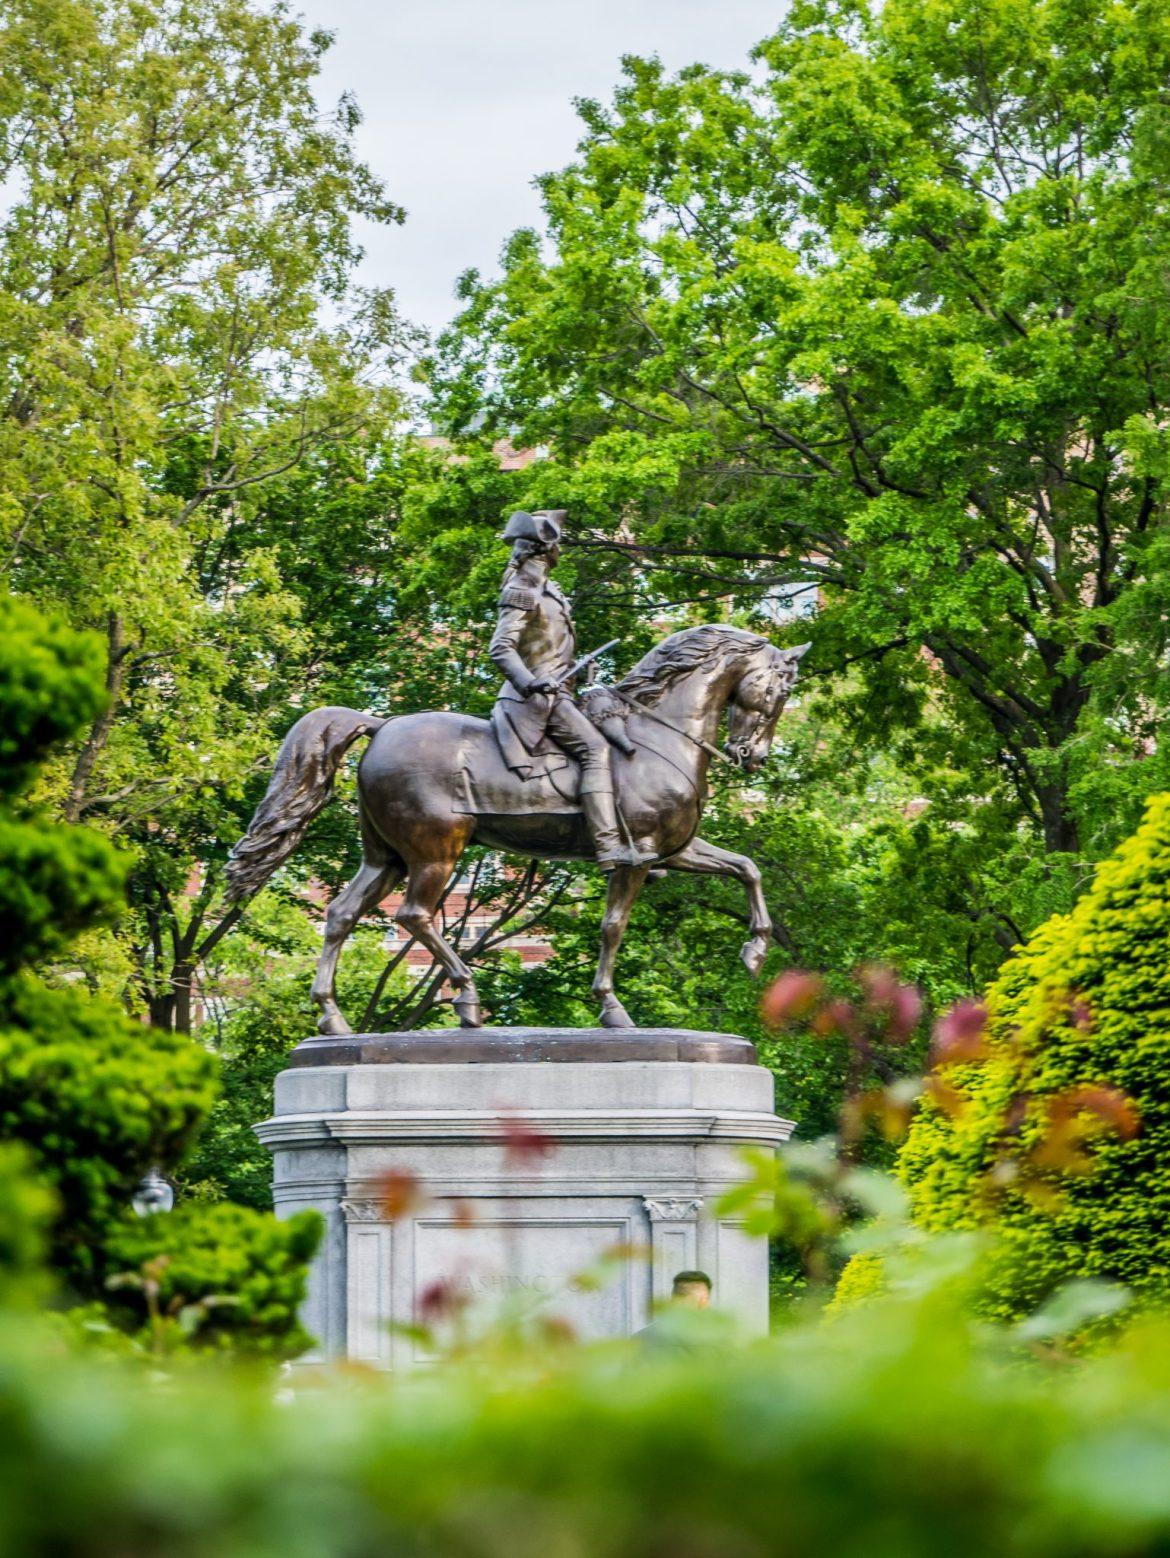 Pomnik Waszyngtona w Boston Garden